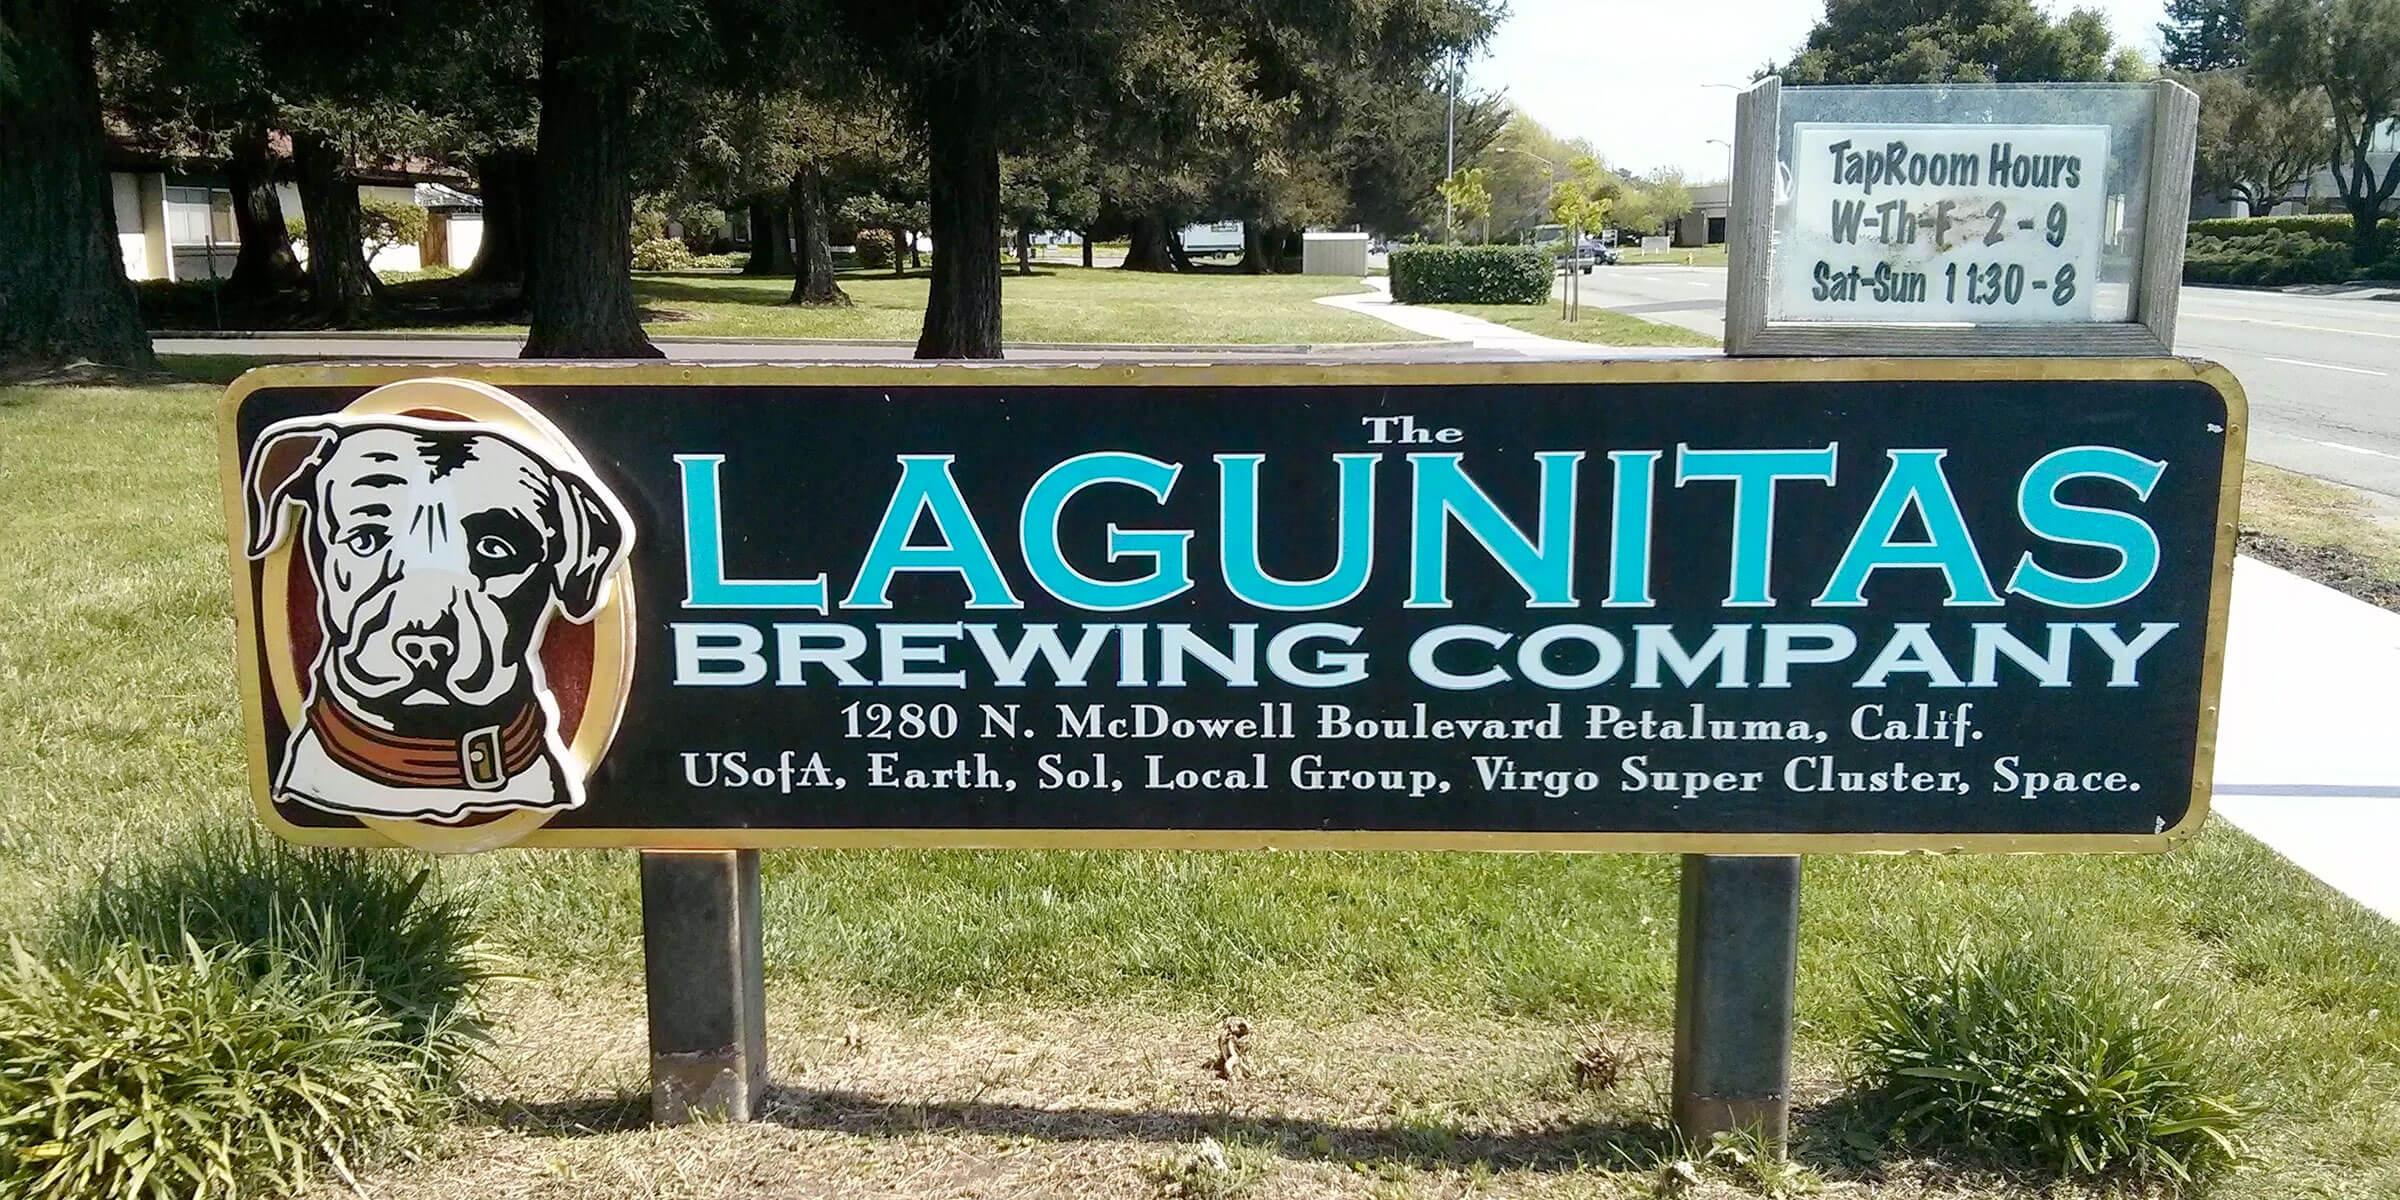 Signage posted outside the Lagunitas Brewing Company taproom in Petaluma, California